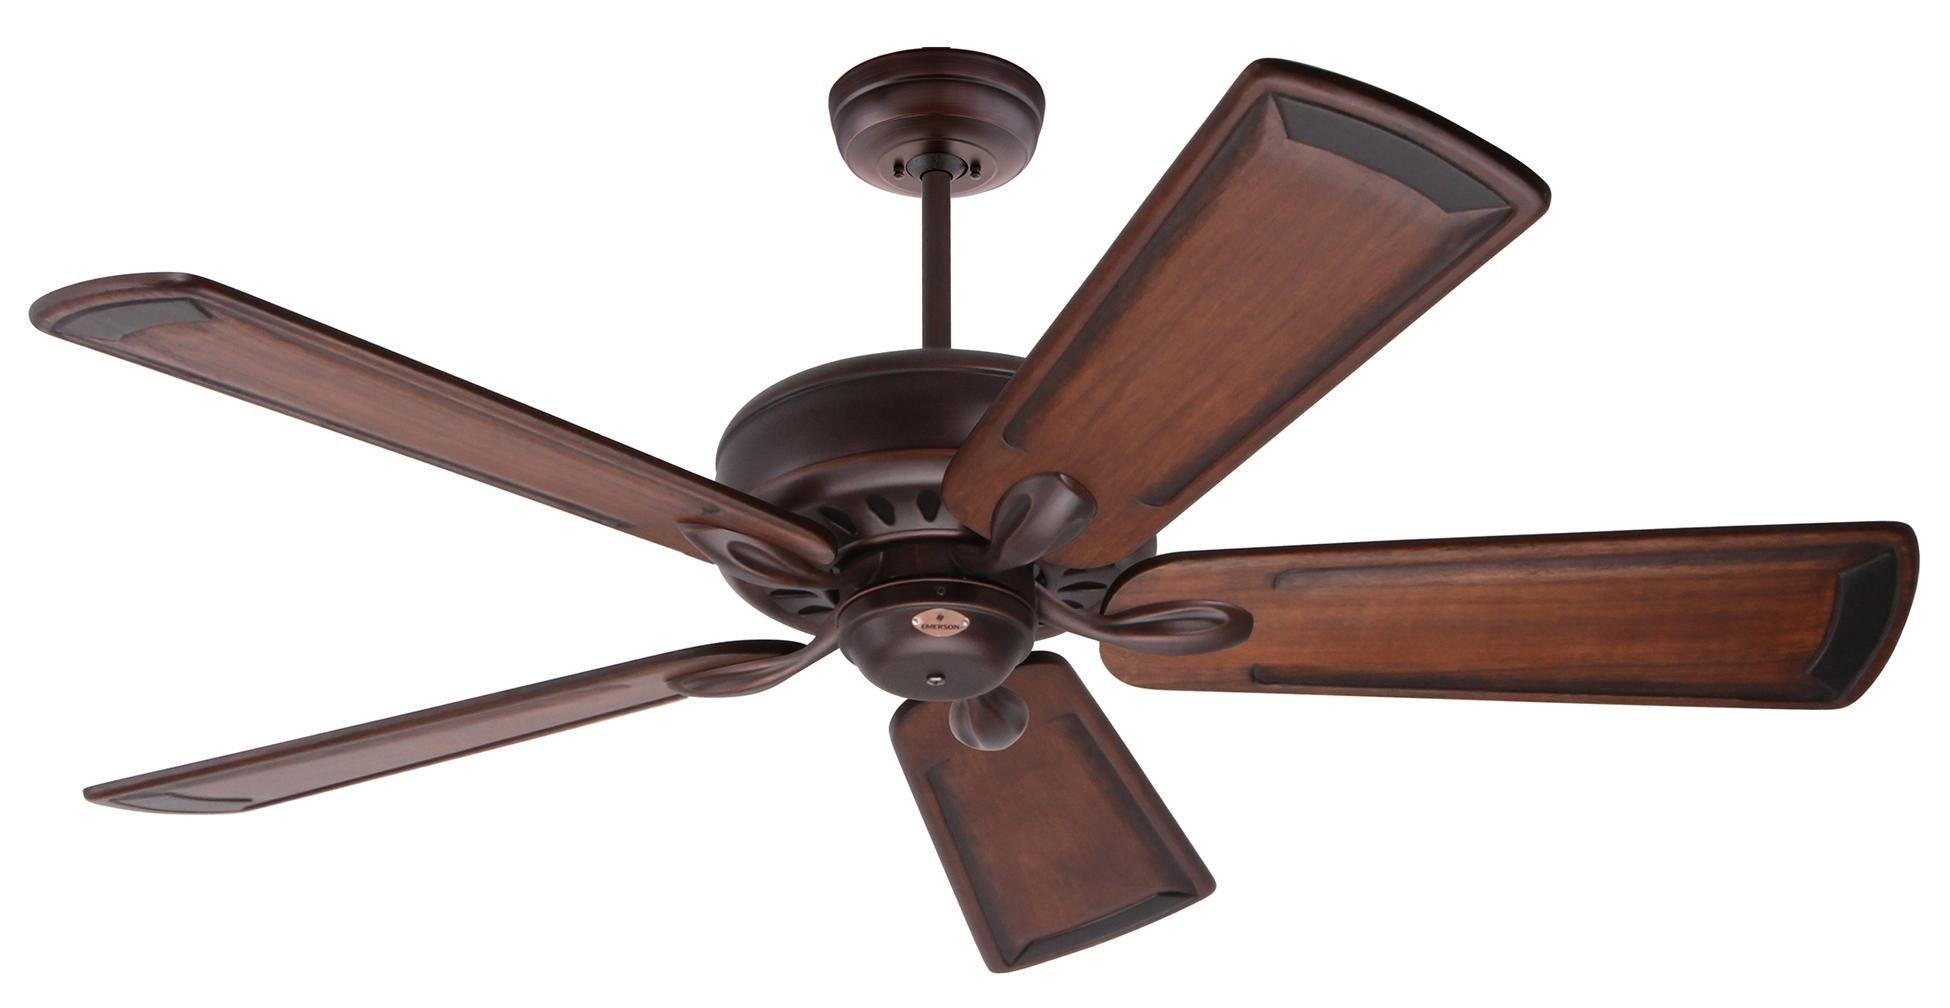 emerson avant eco 54 dc motor ceiling fan bronze craftmade warplane